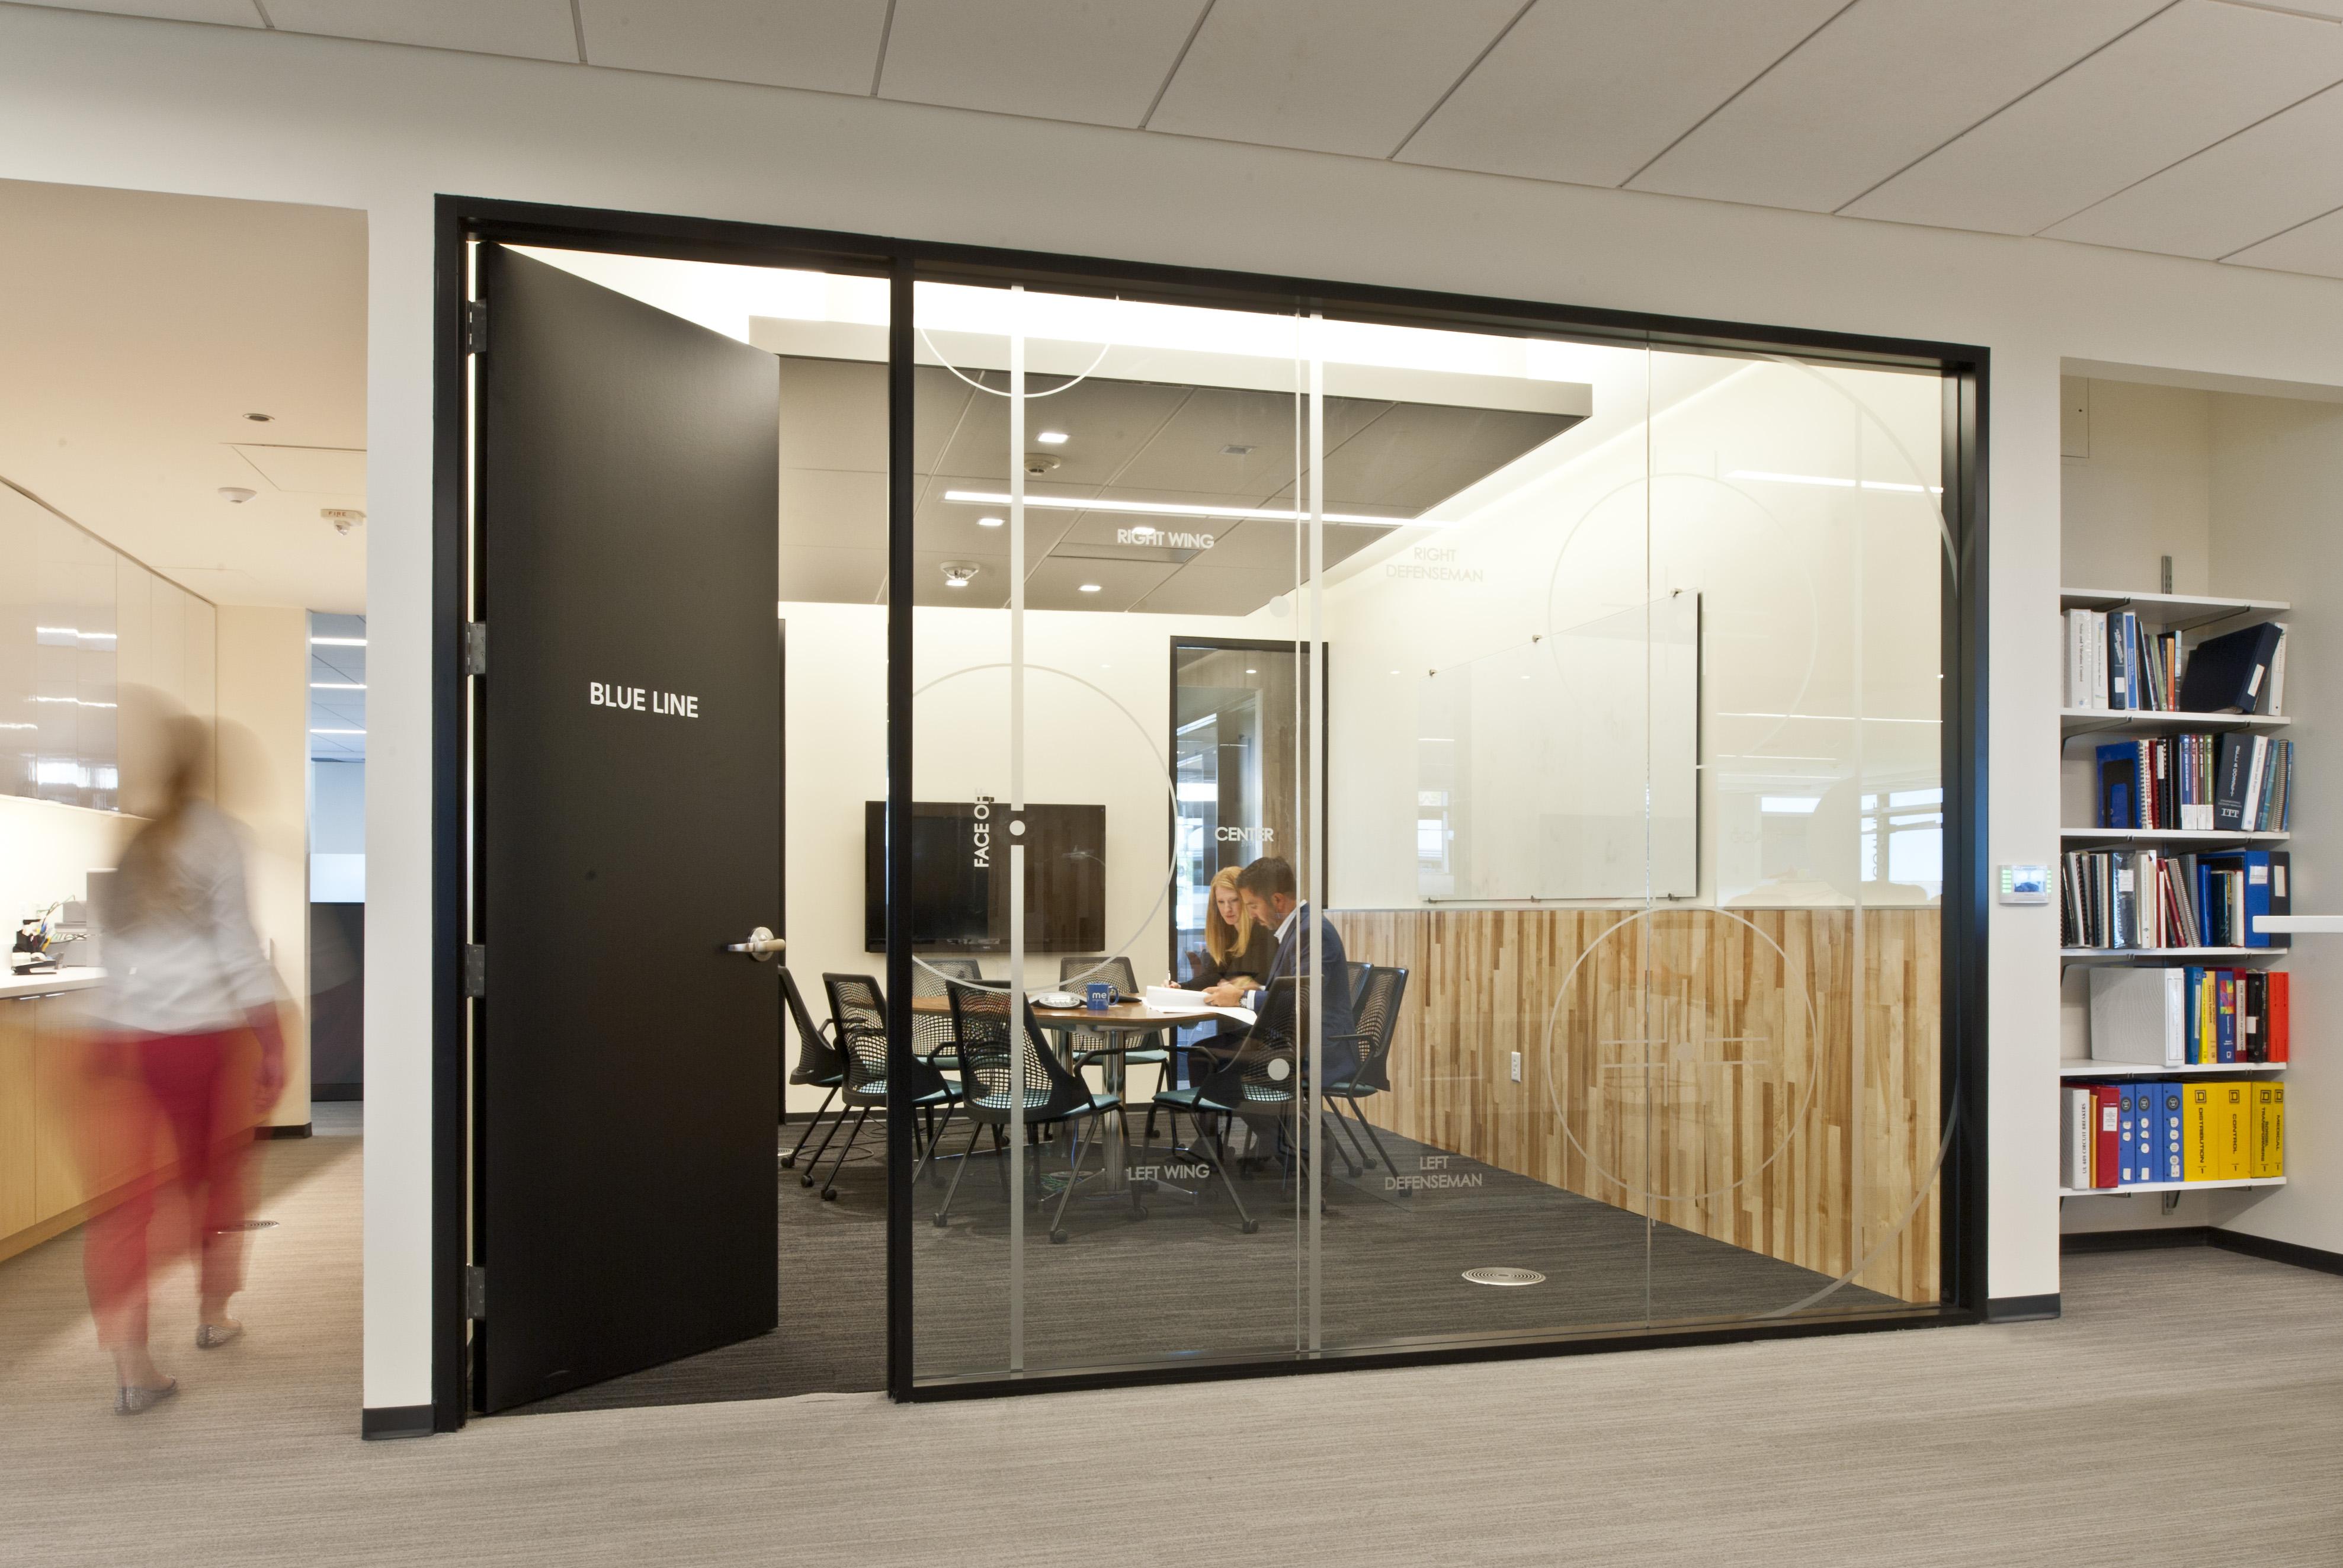 Open Studio Archicture ME Engineers Conference Room Branding OSA